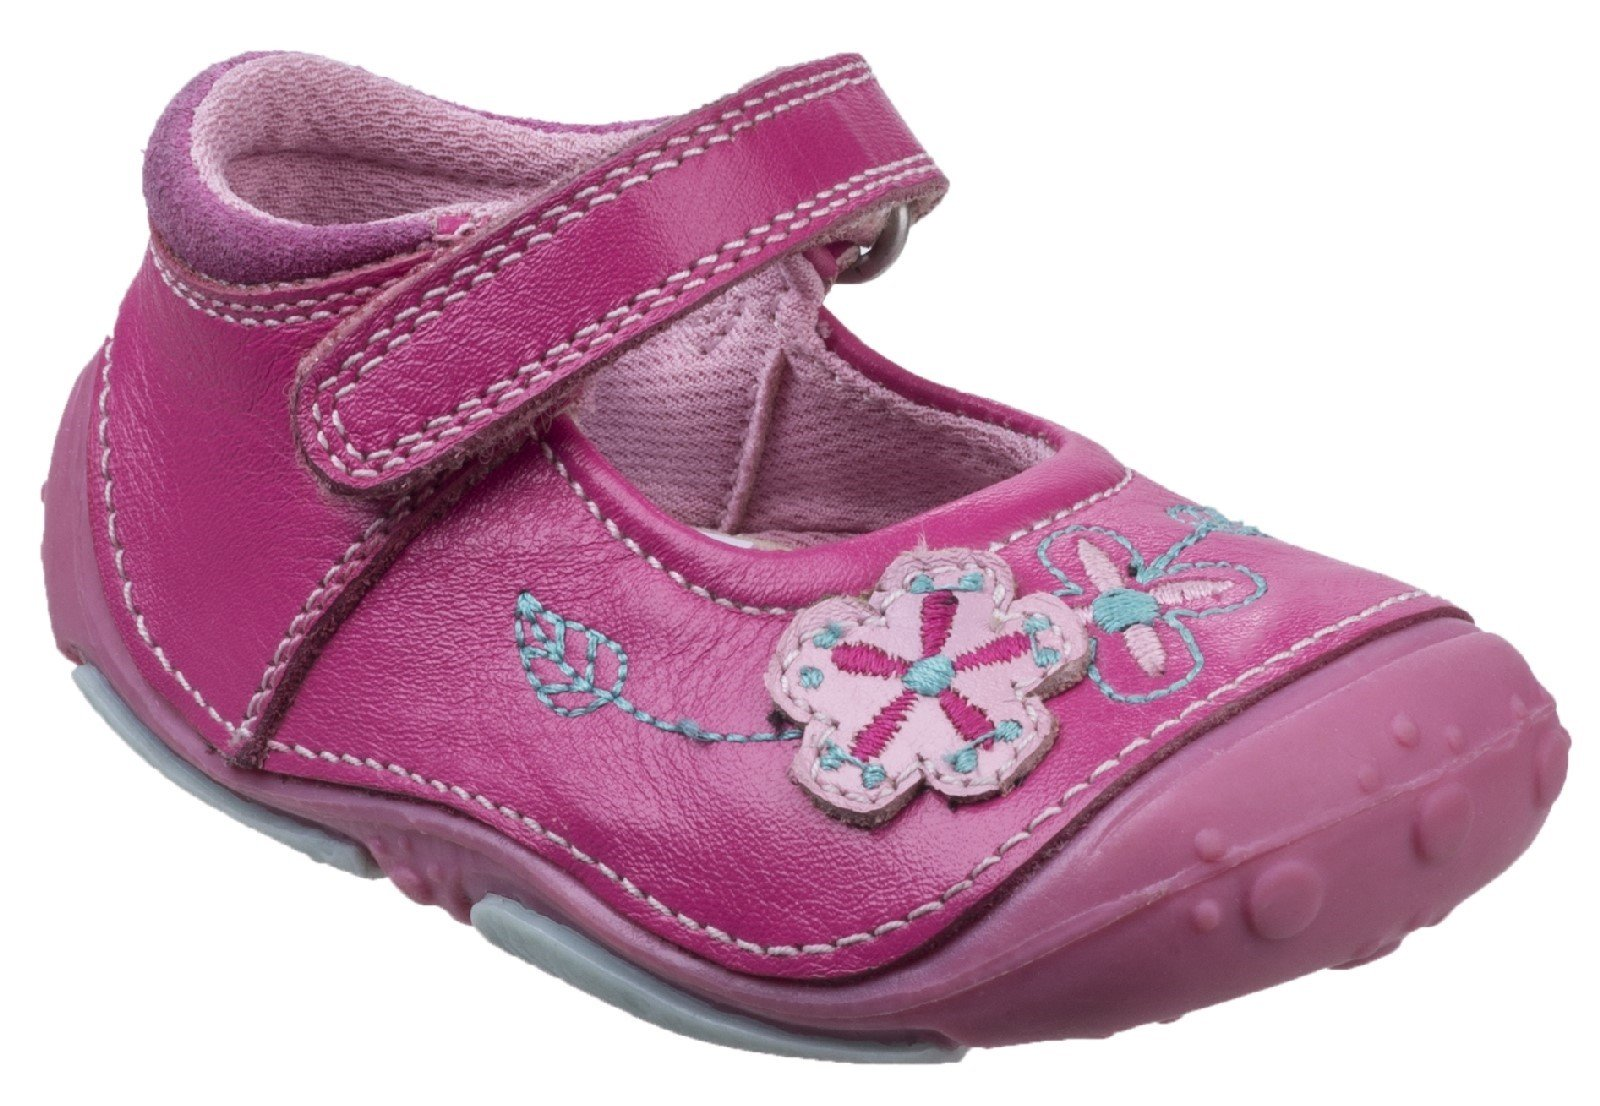 Hush Puppies Women's Lara Touch Fastening Sandal Light Blue 26392 - Light Pink 2